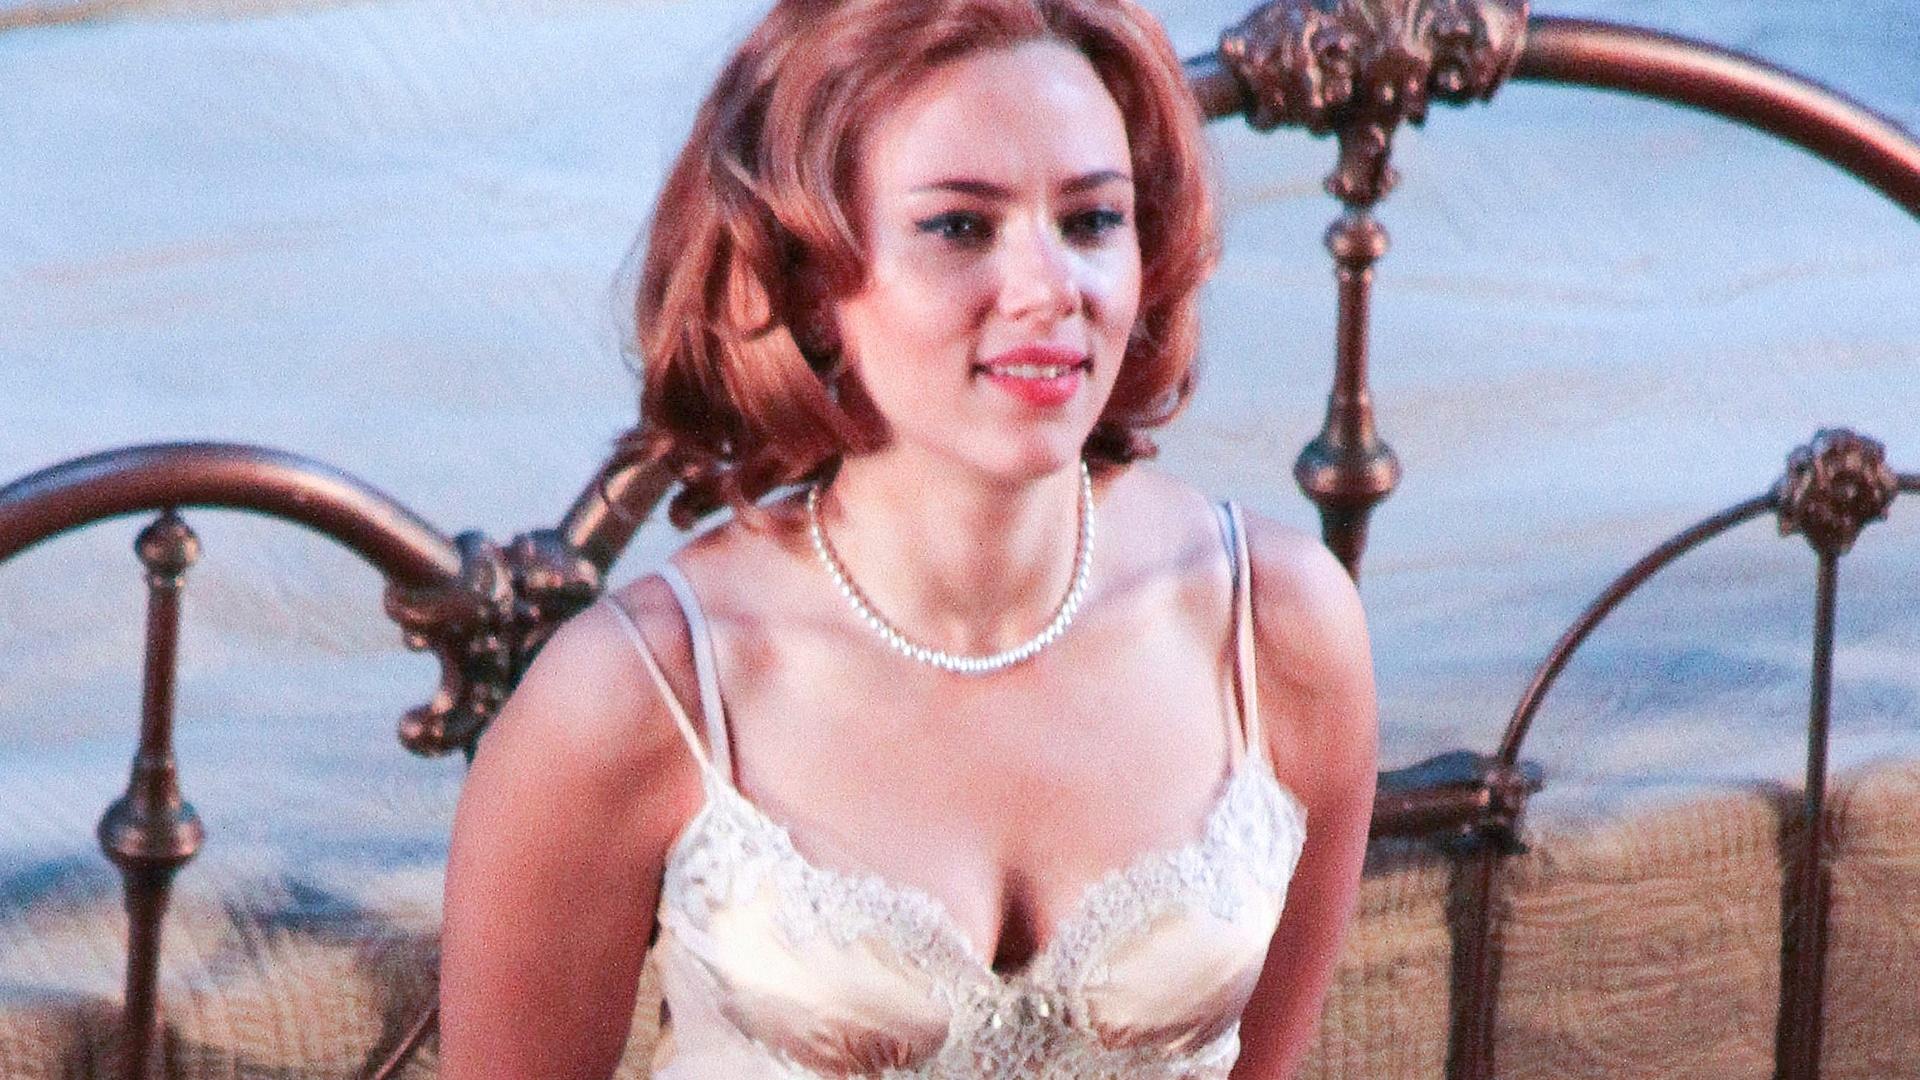 21.dez.2012 - A atriz Scarlett Johansson estreou na Broadway nesta sexta-feira (21) a peça